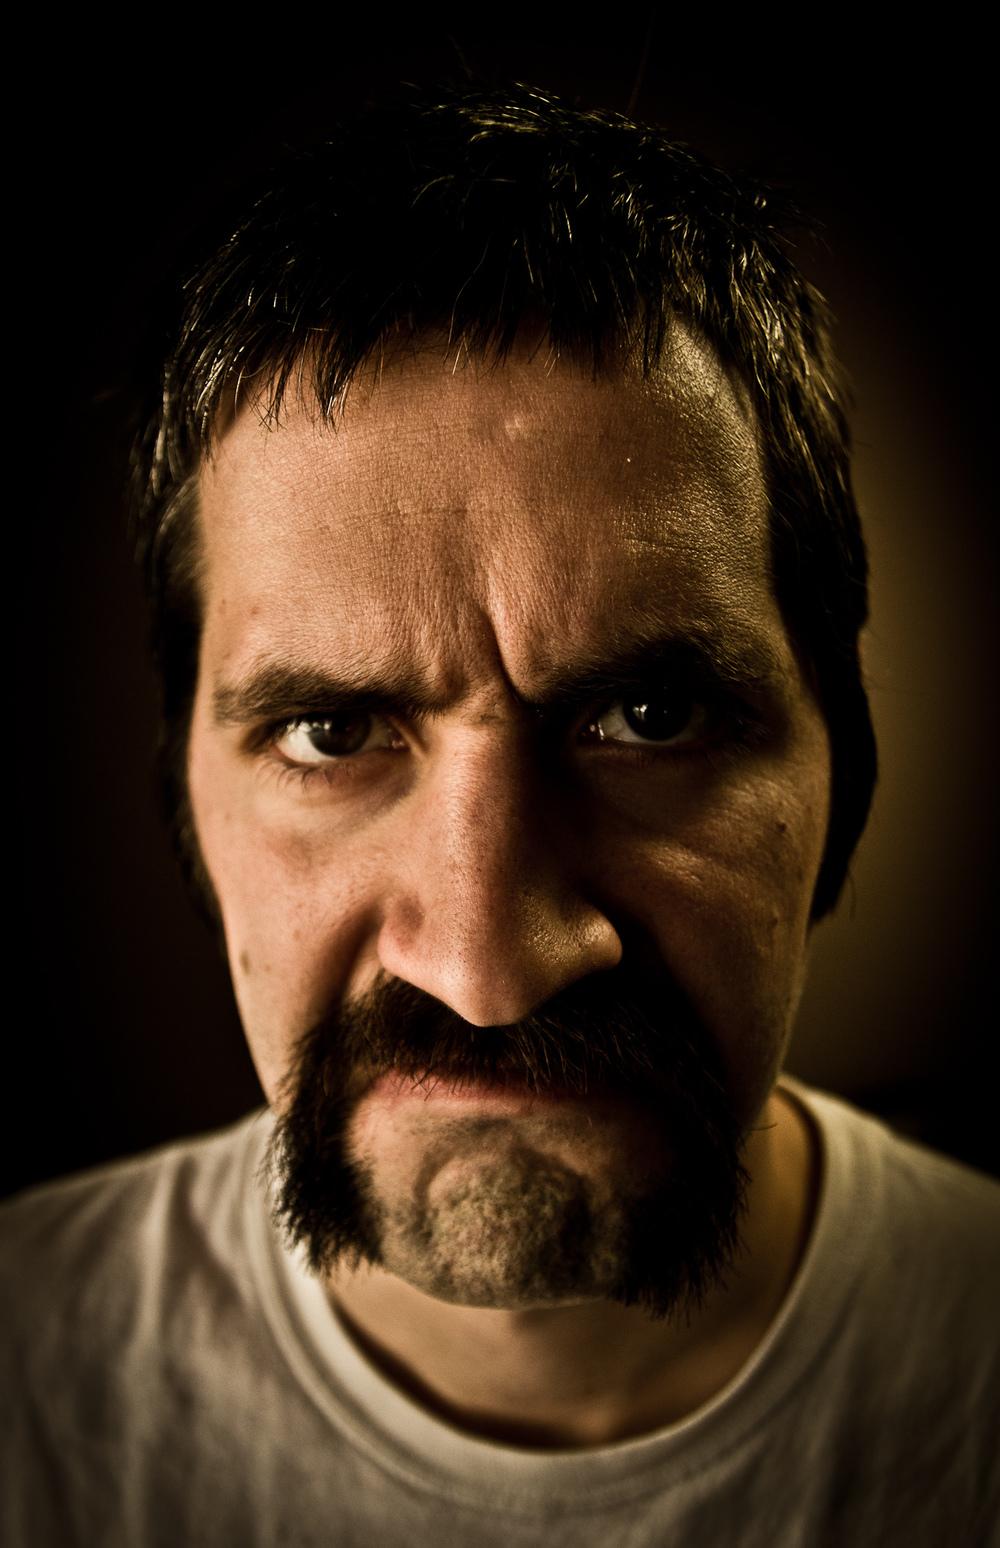 Dangerous Man-1-3.jpg